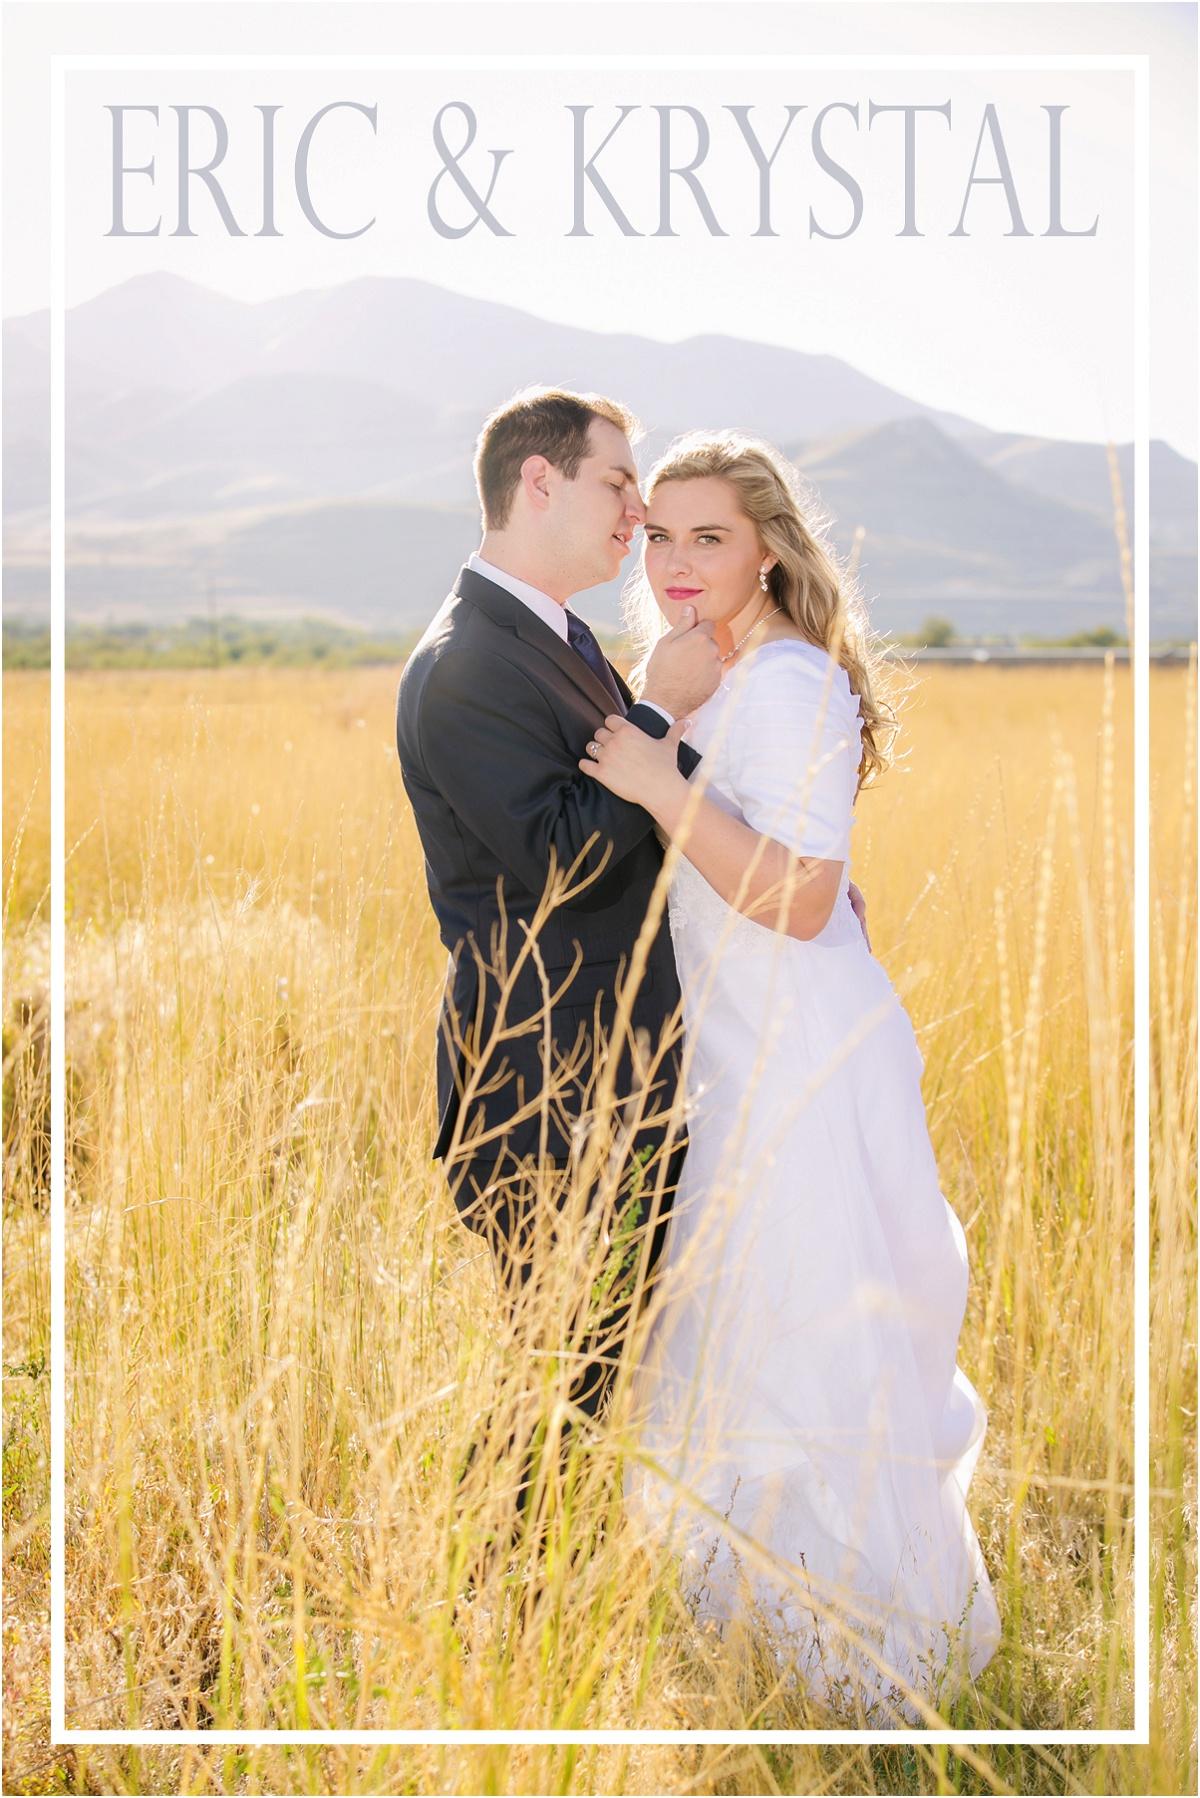 Terra Cooper Photography Weddings Brides 2015_5400.jpg